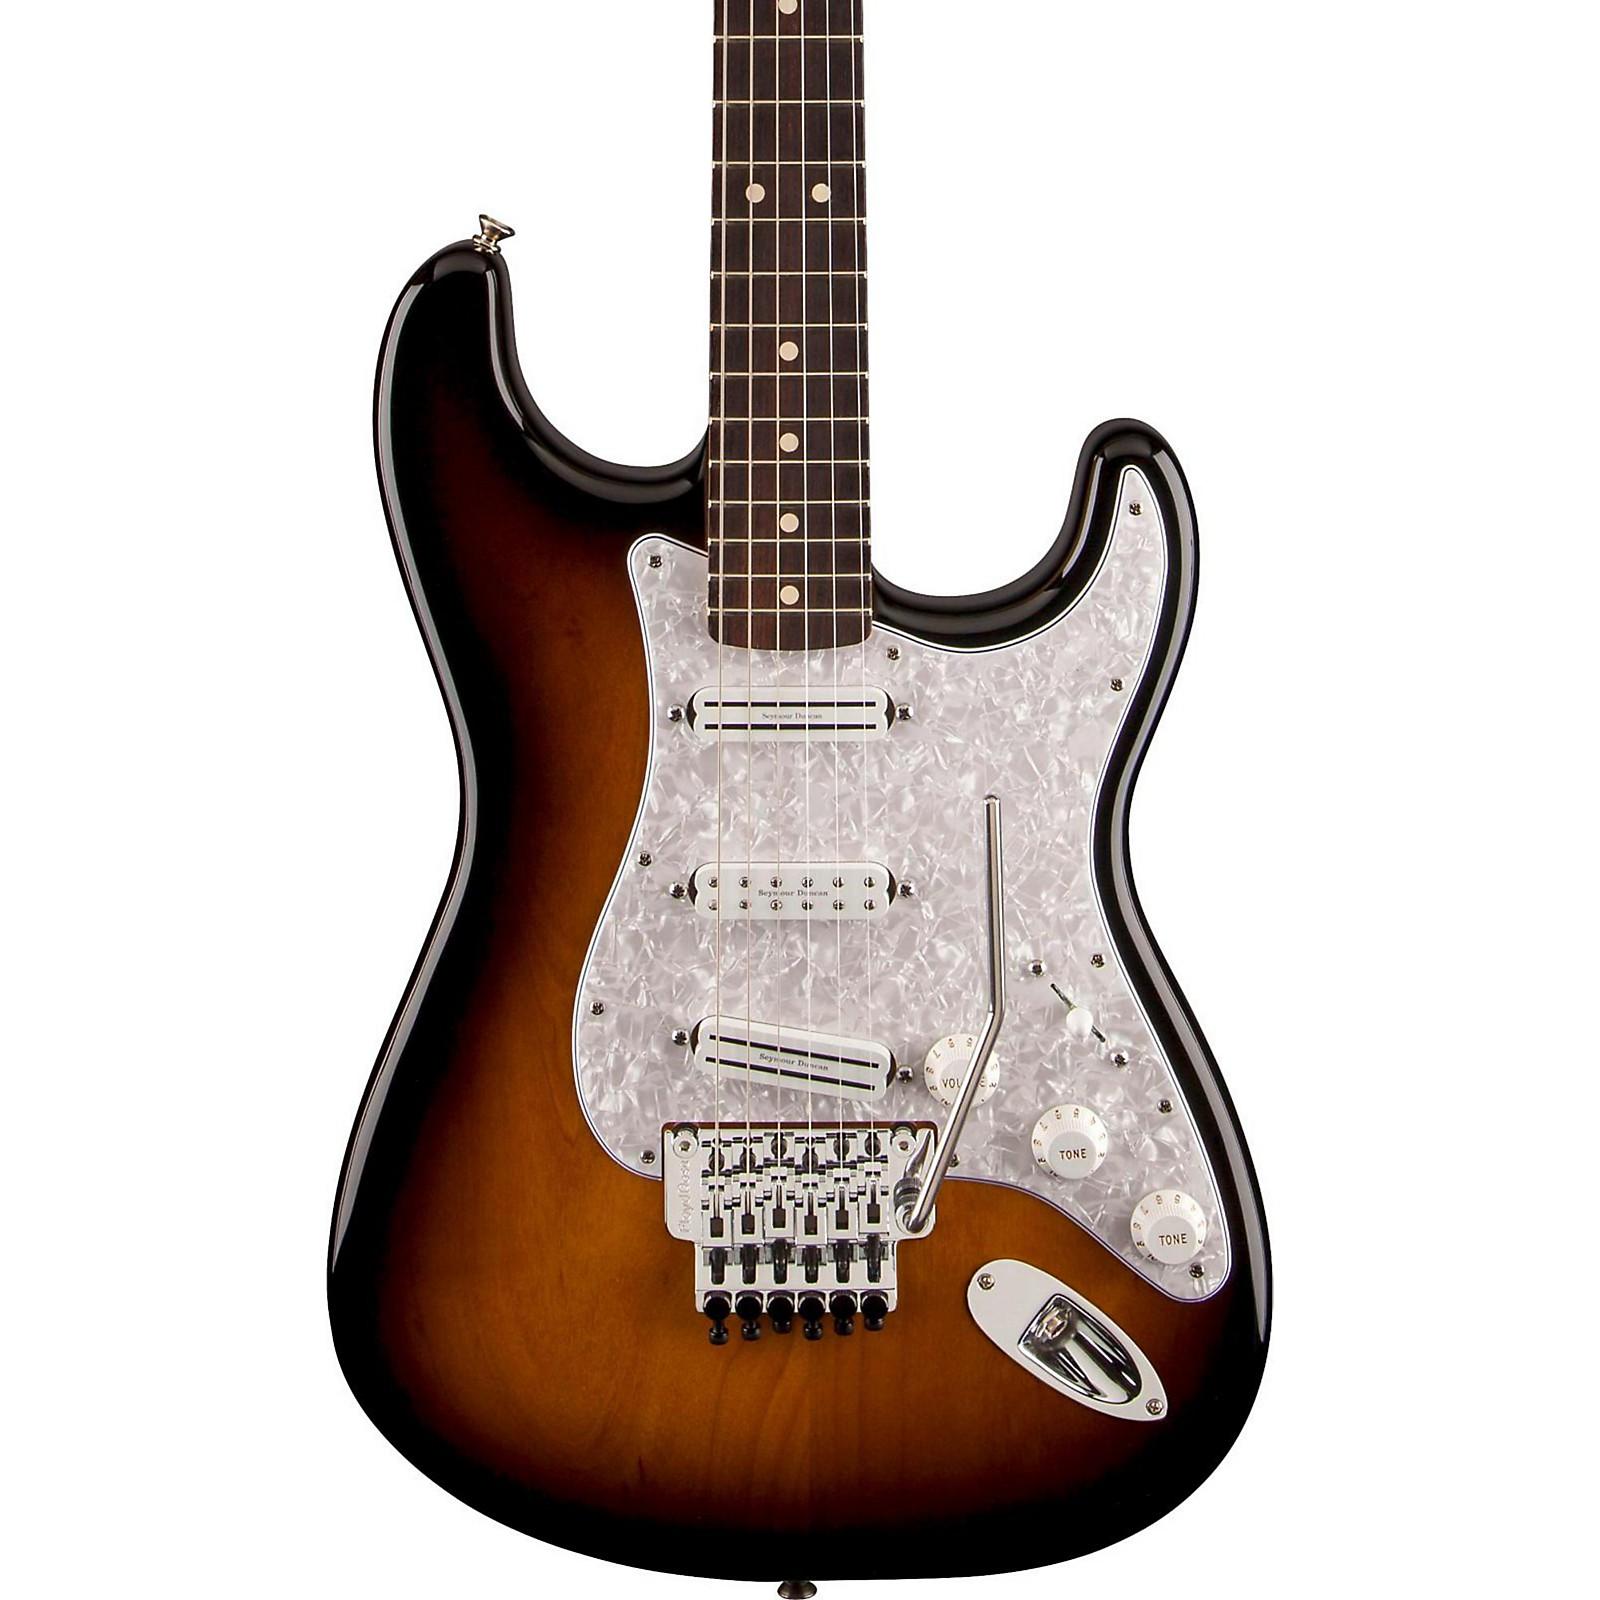 Fender Dave Murray Signature HHH Stratocaster Electric Guitar